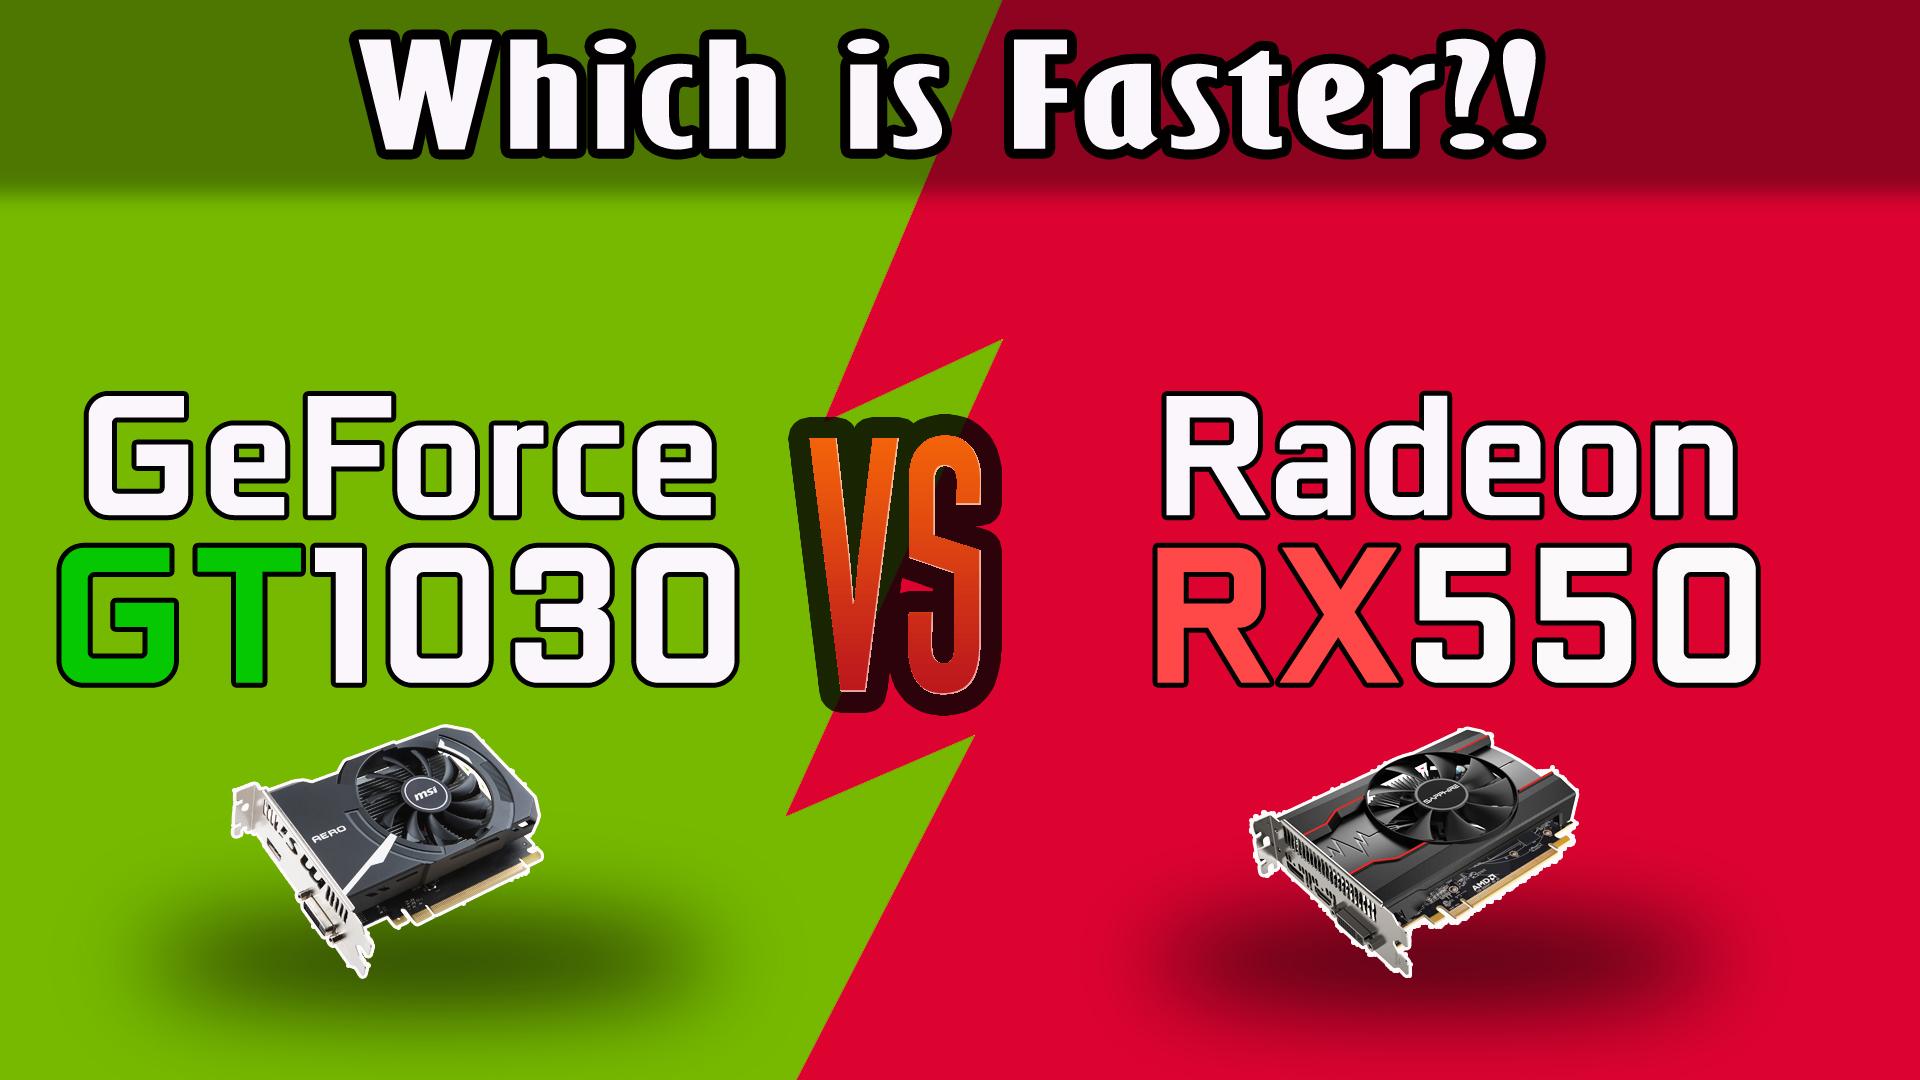 GeForce GT 1030 vs Radeon RX 550 Test in 8 Games (Core i3-4130